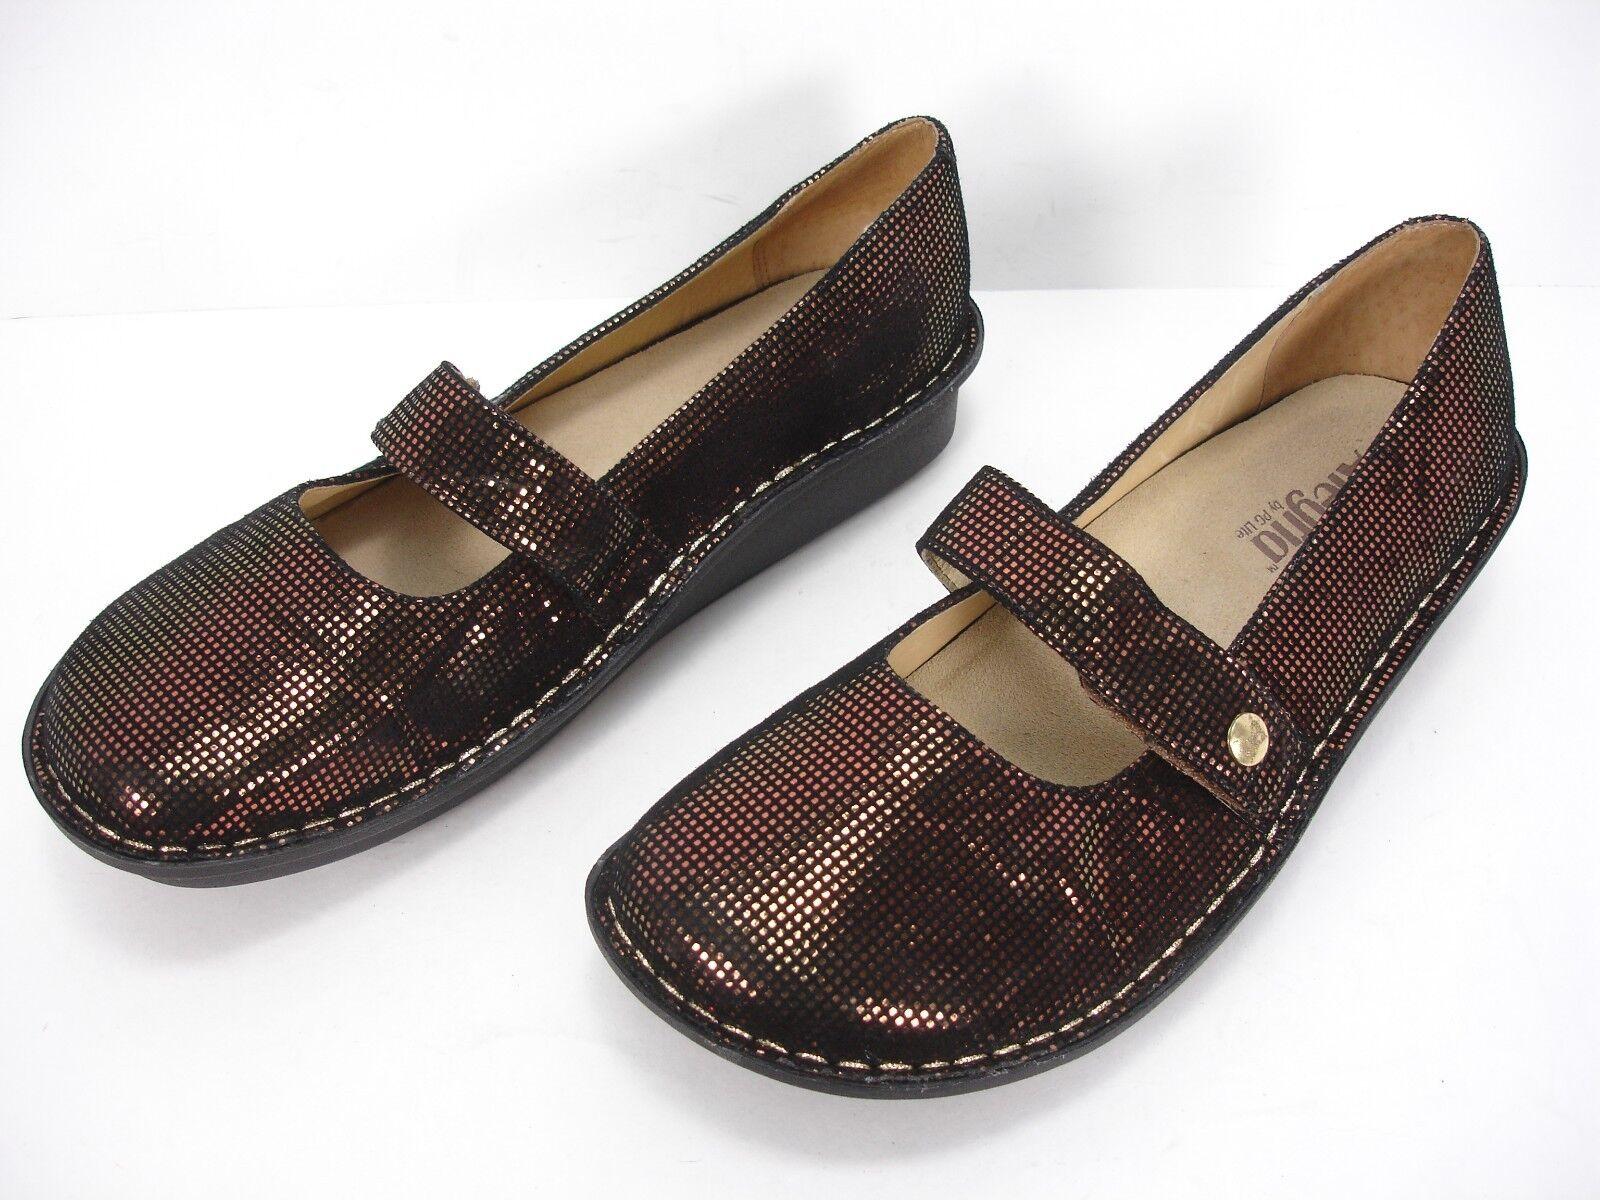 Alegria PG LITE Feliz FEL-348 bronze Prisme Cuir Mary Jane Chaussures femmes 41 Comme neuf